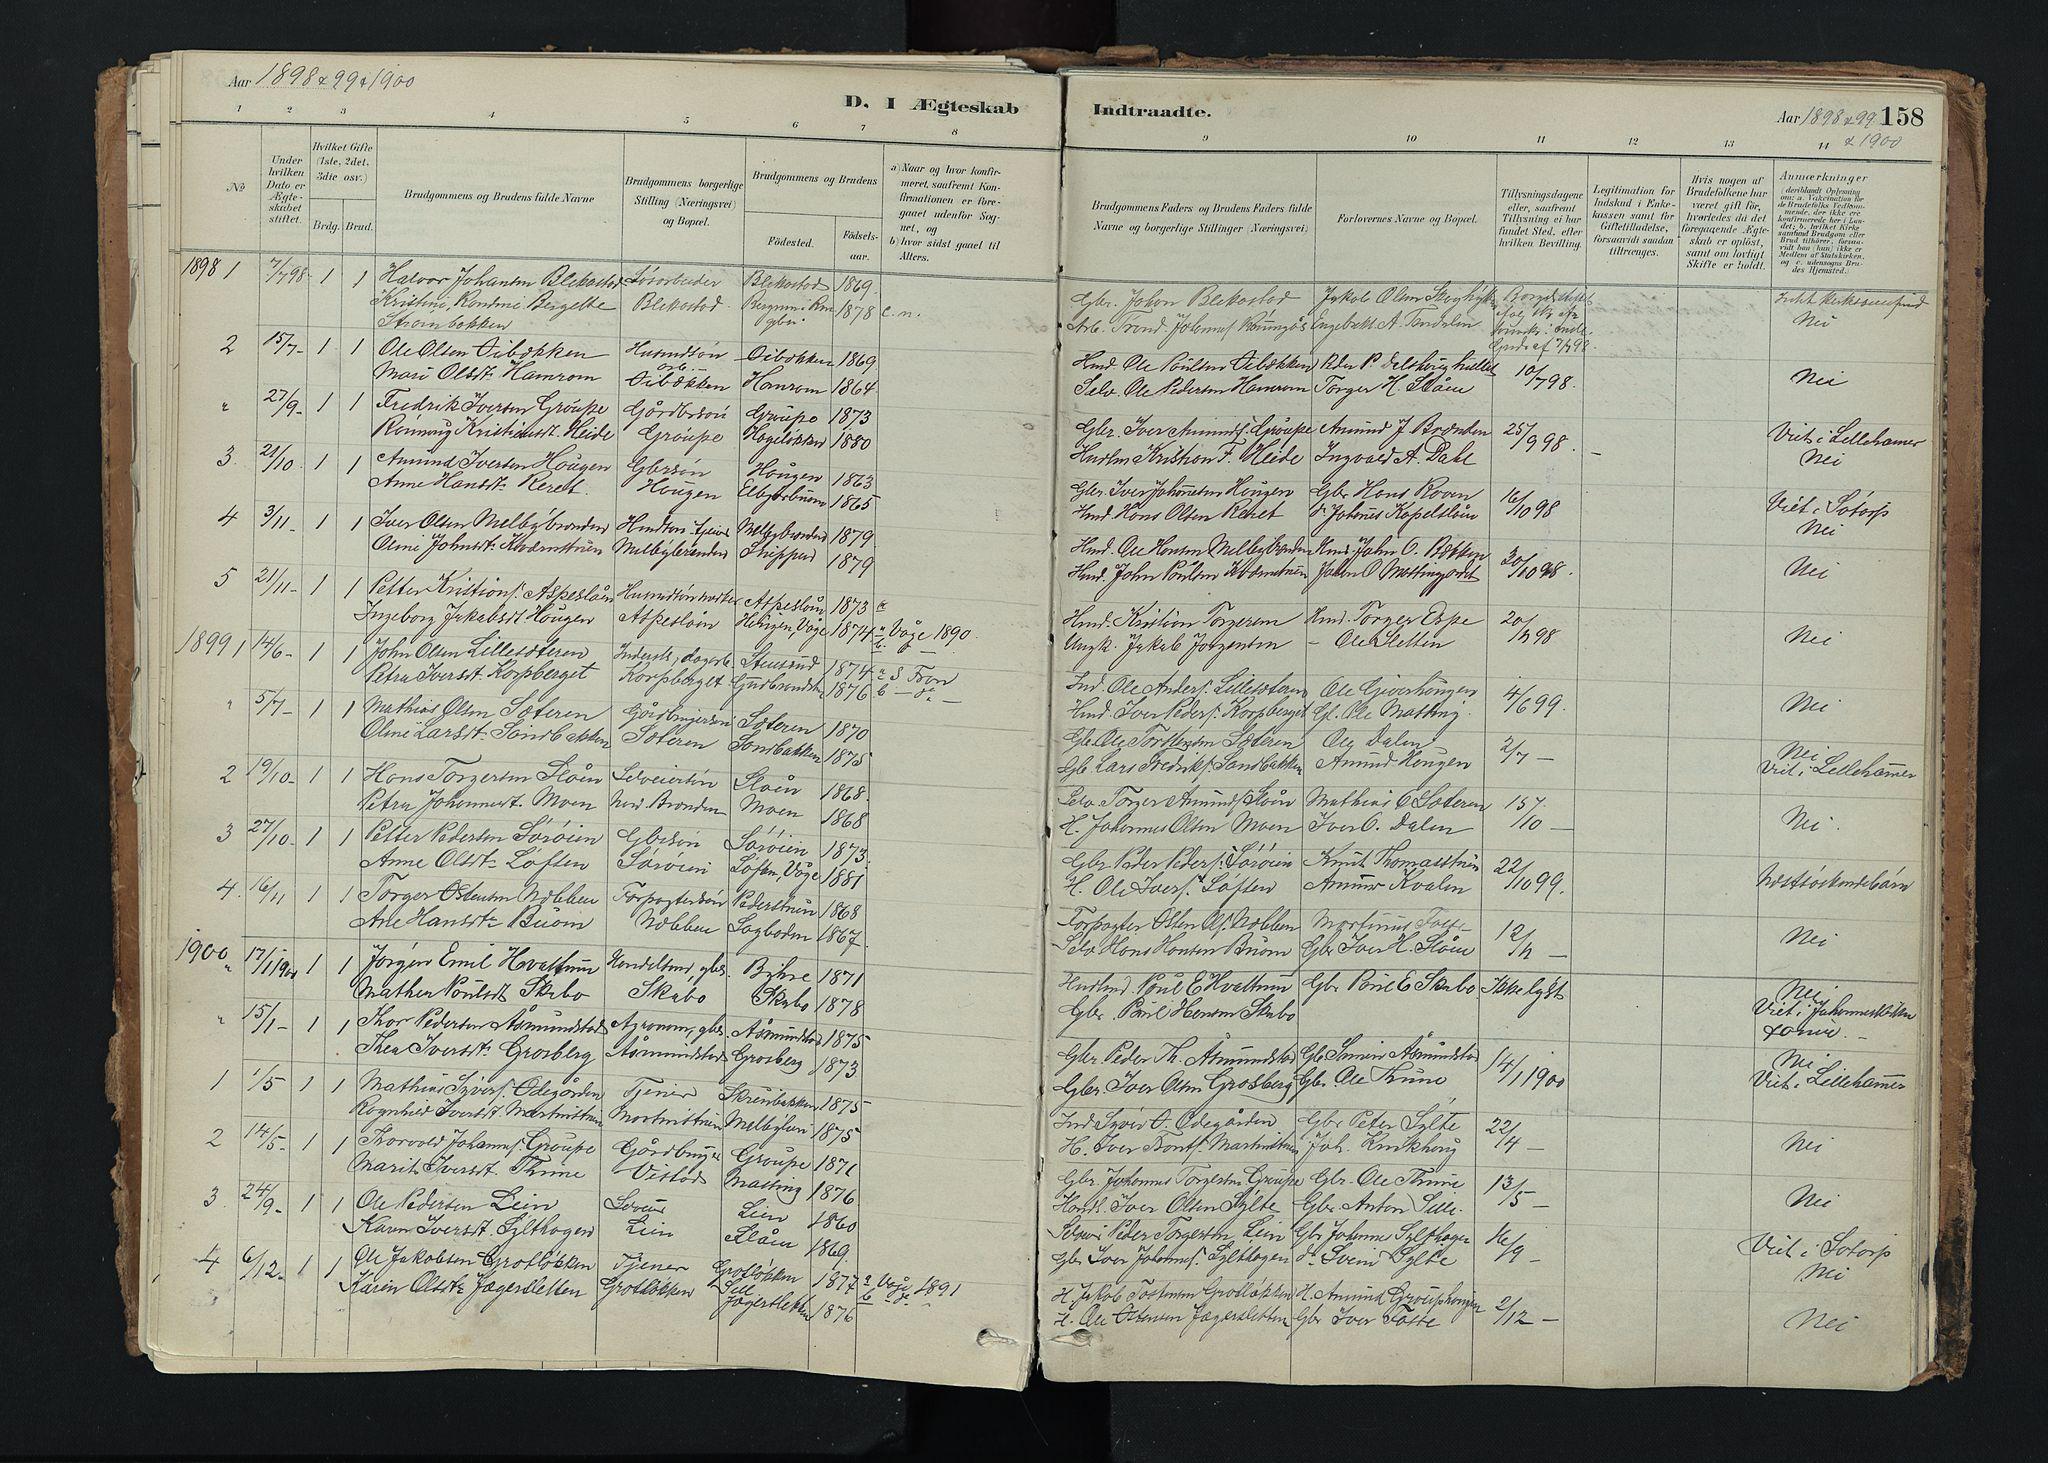 SAH, Nord-Fron prestekontor, Ministerialbok nr. 5, 1884-1914, s. 158